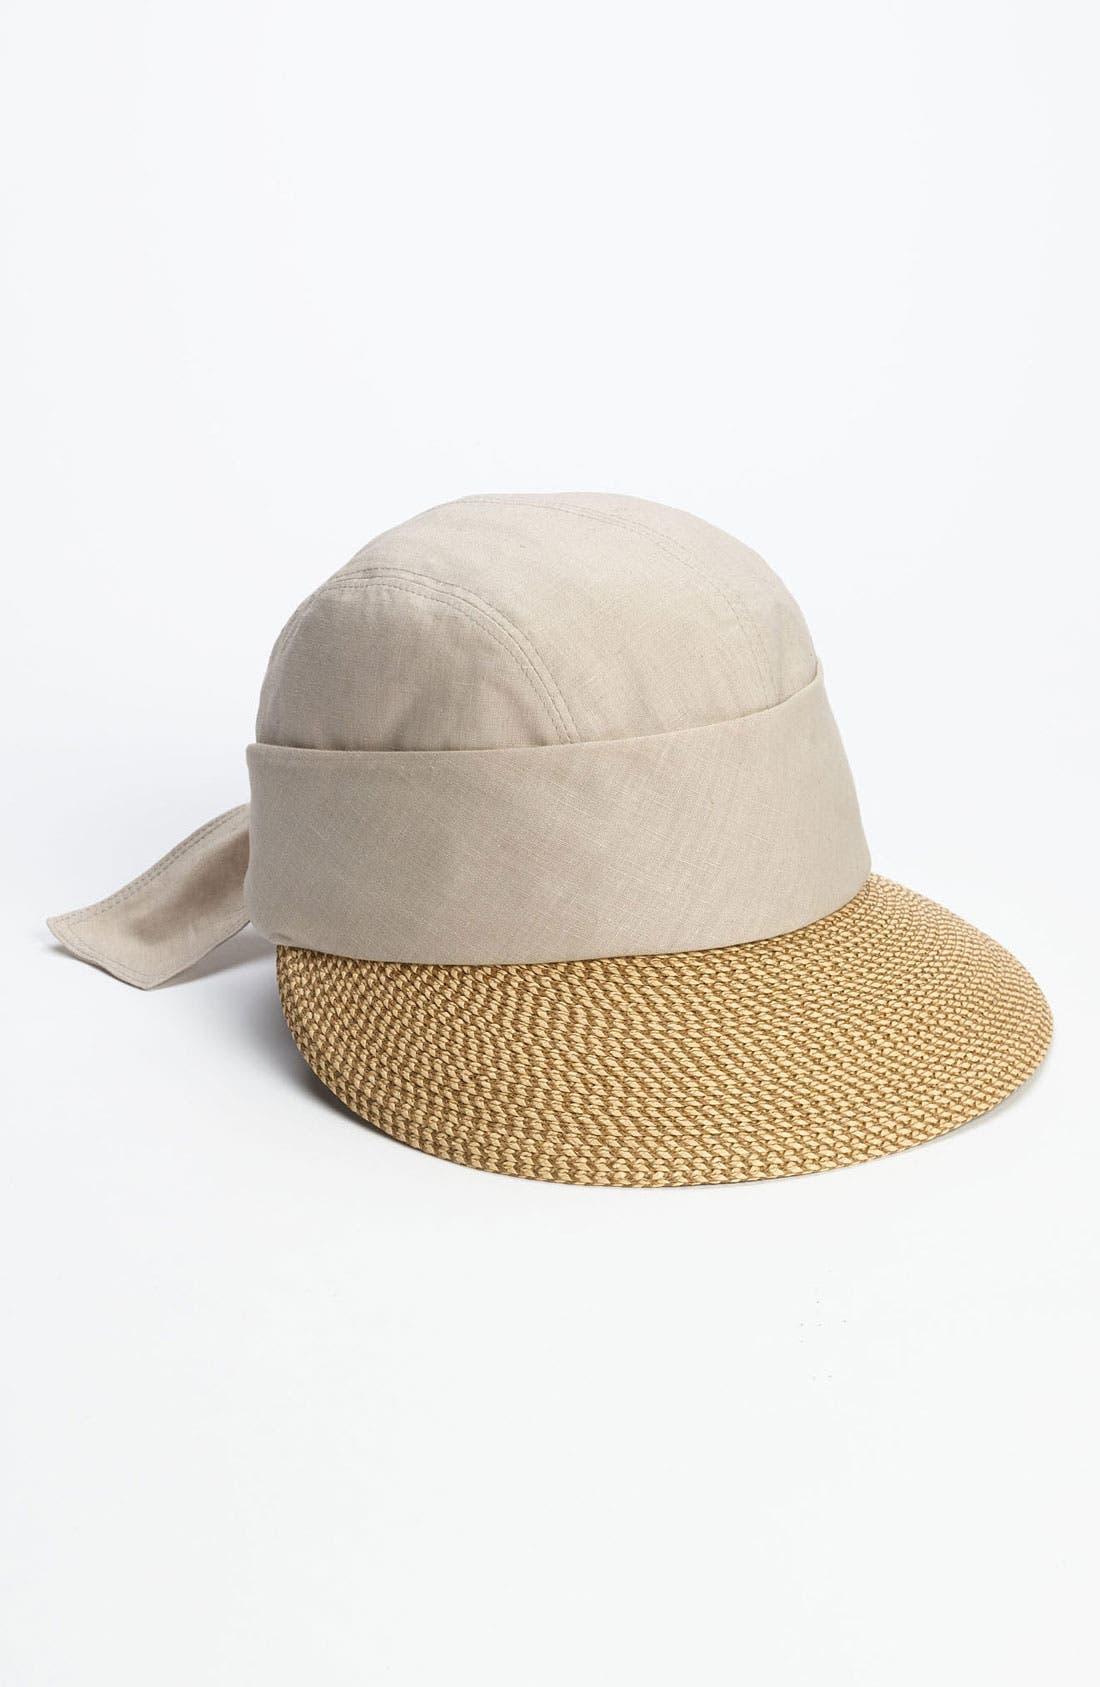 Main Image - Eric Javits Convertible Sun Hat